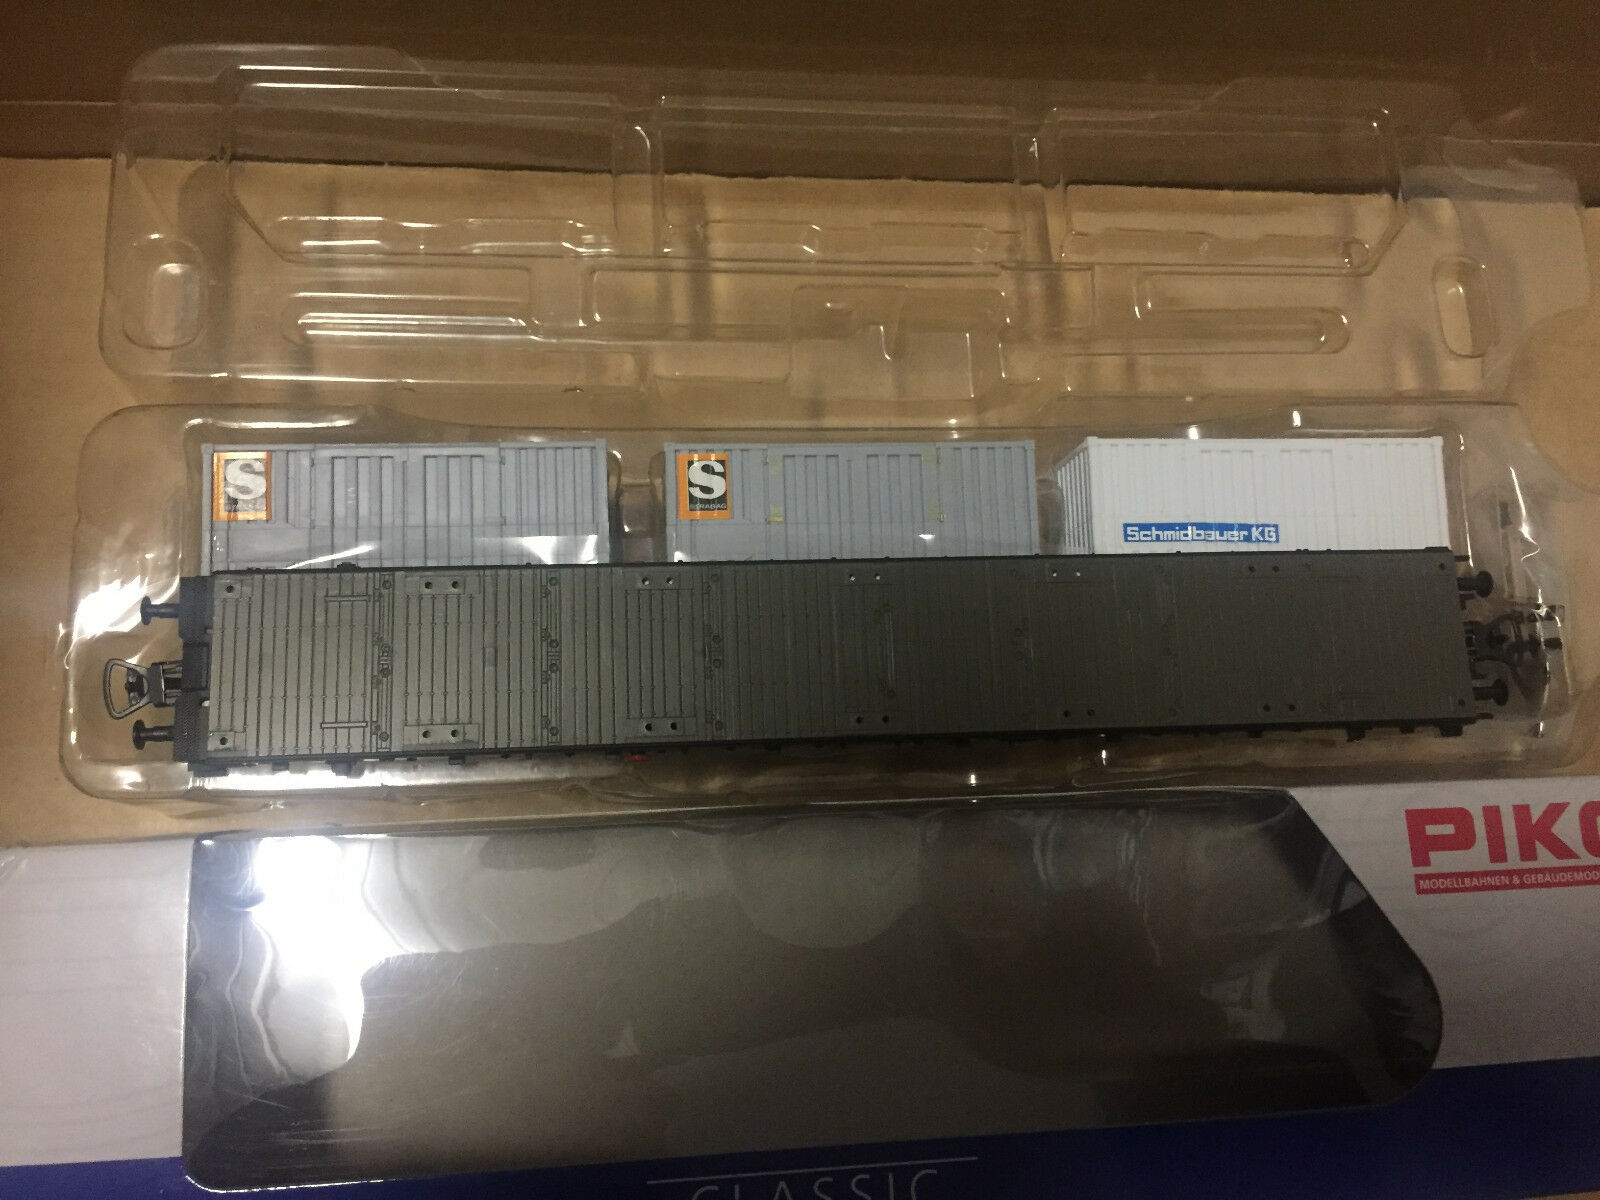 PIKO h0 95489 piatto carrello carrello carrello con 3 container Schmidbauer kg OVP + NUOVO 33cd24